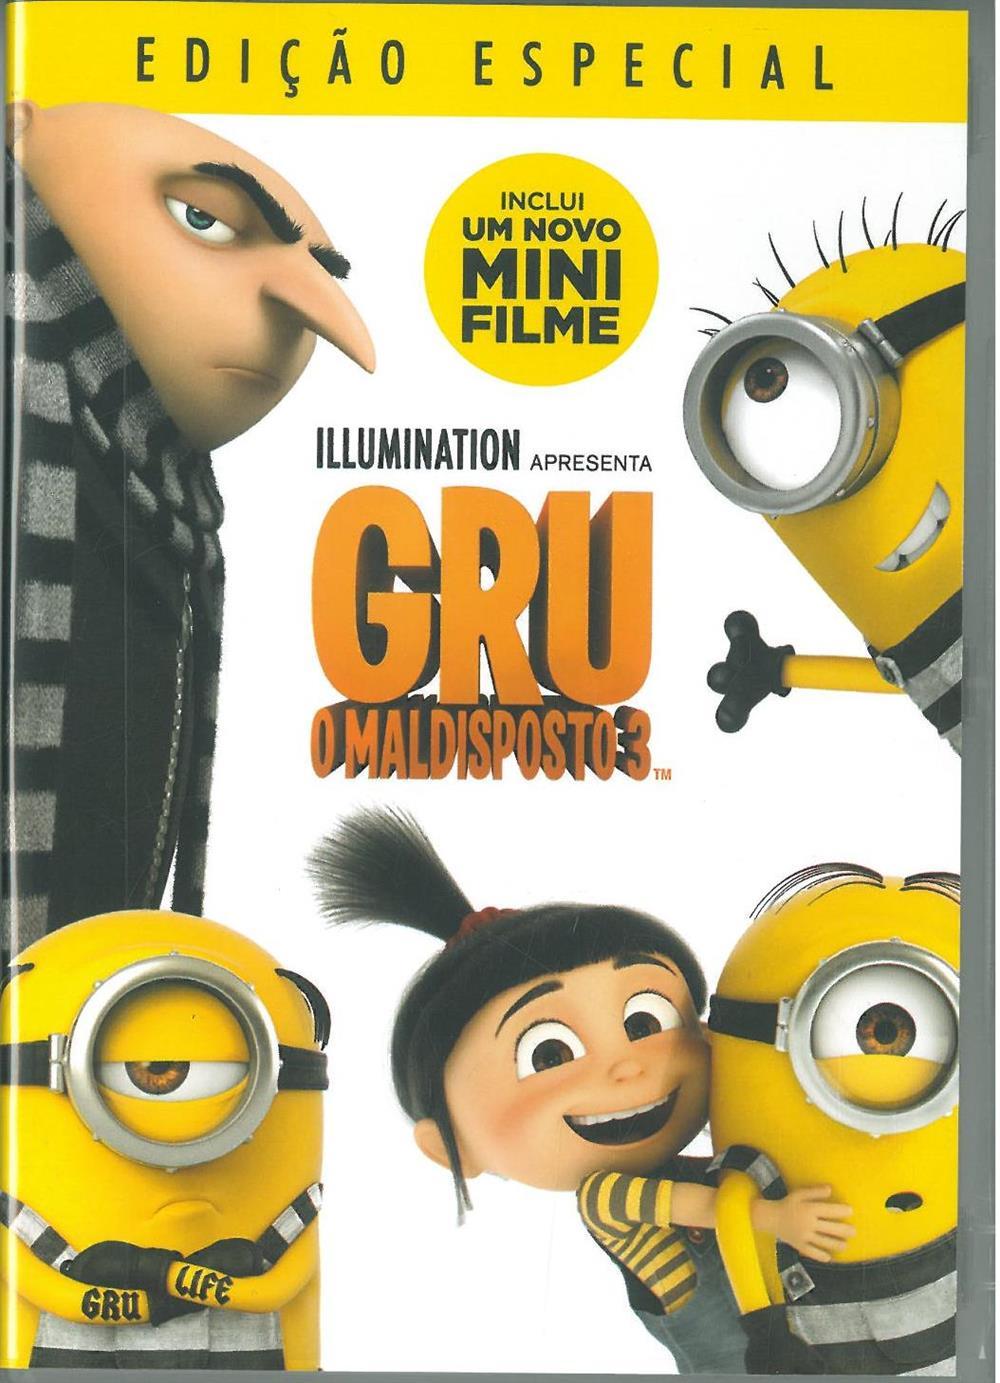 Gru maldisposto 3_DVD.jpg